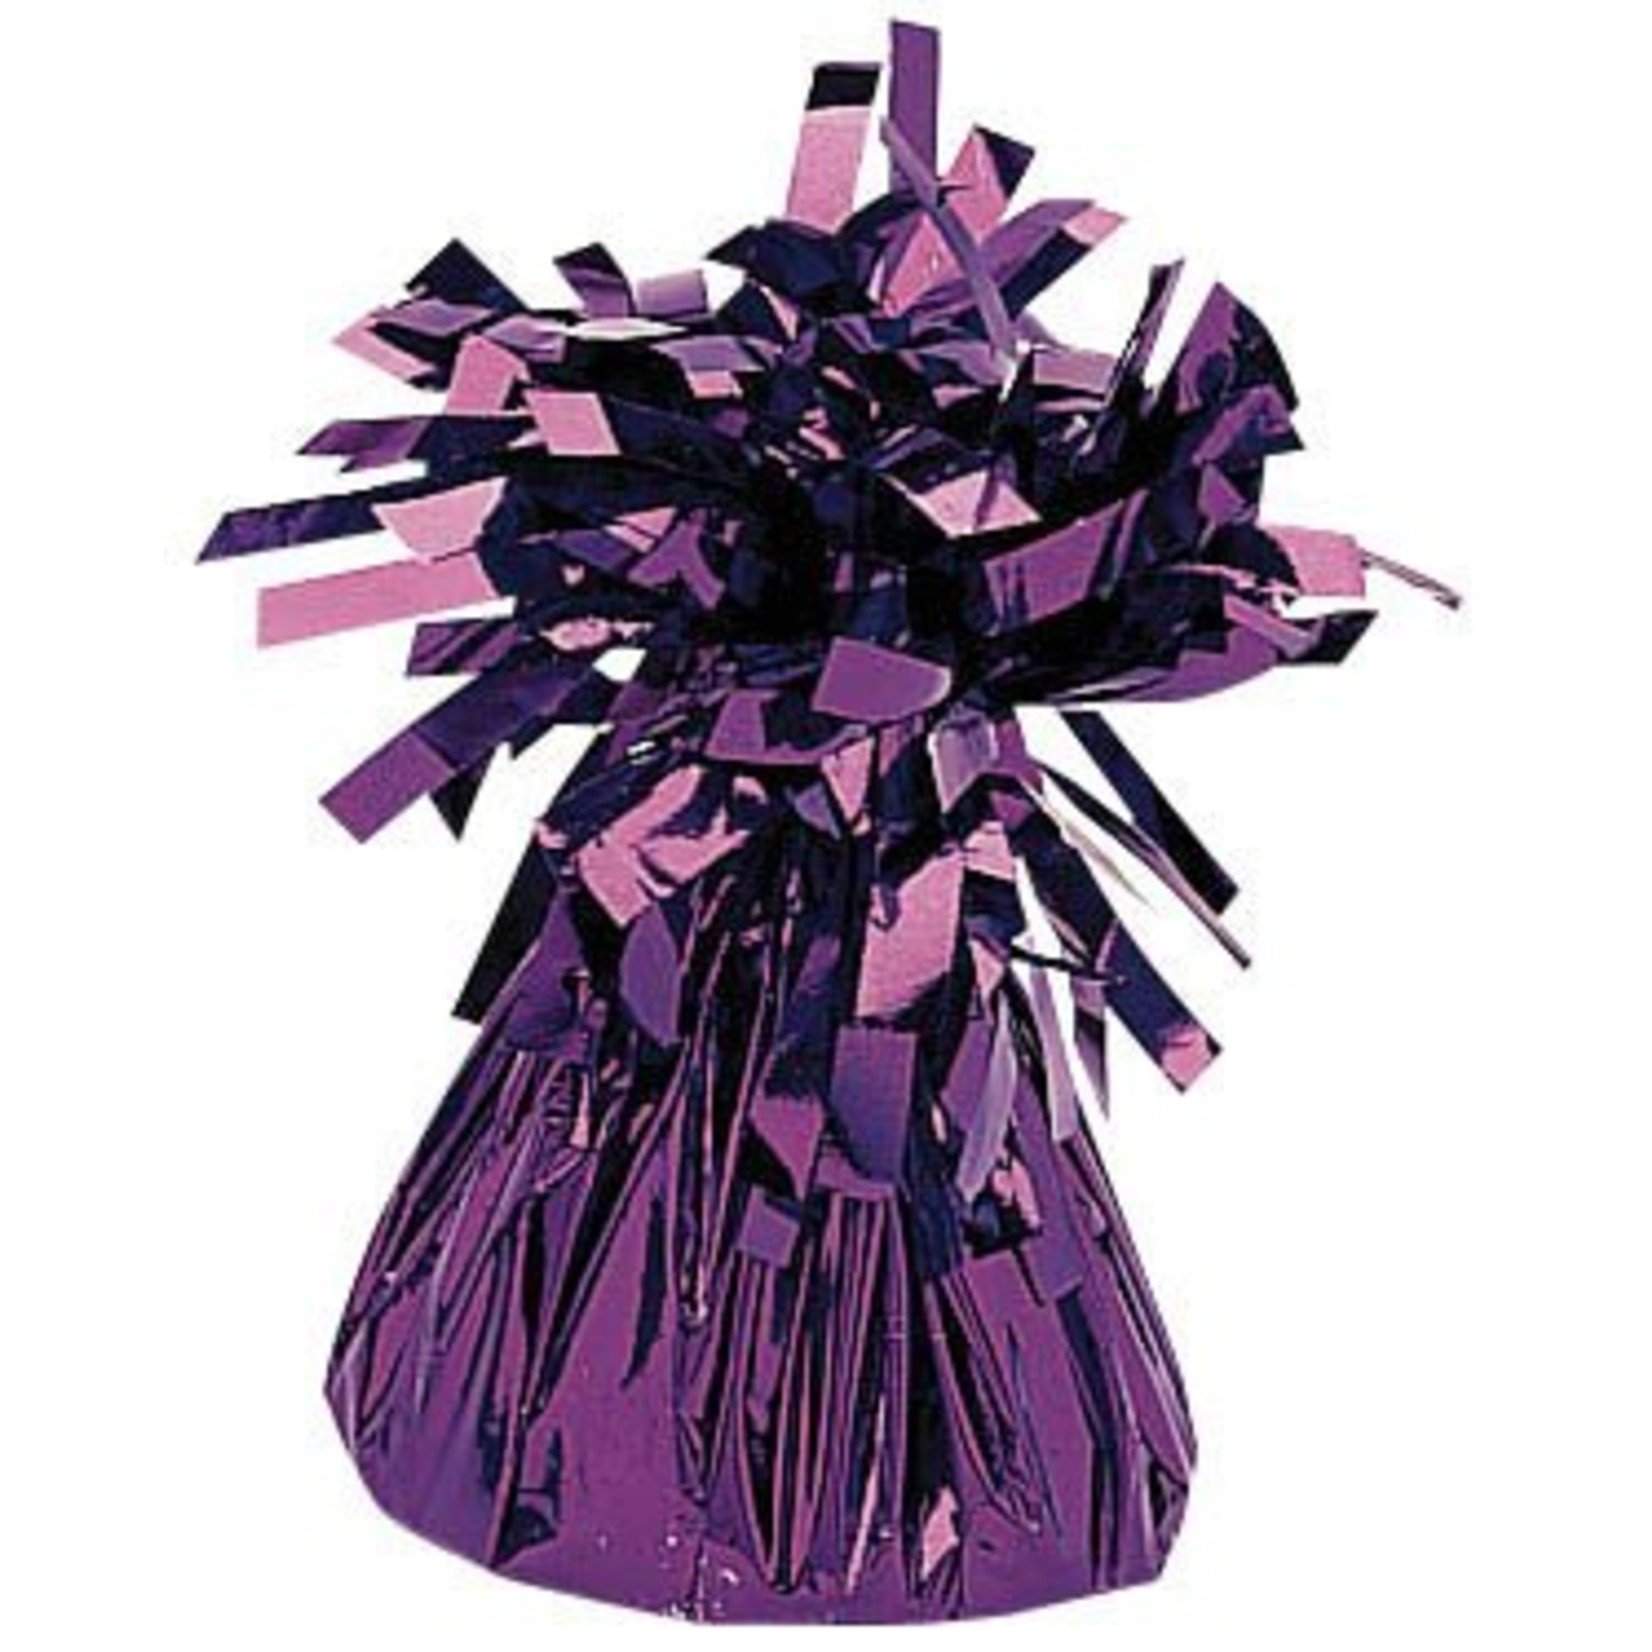 Balloon Weight-Small Foil-Purple-6oz